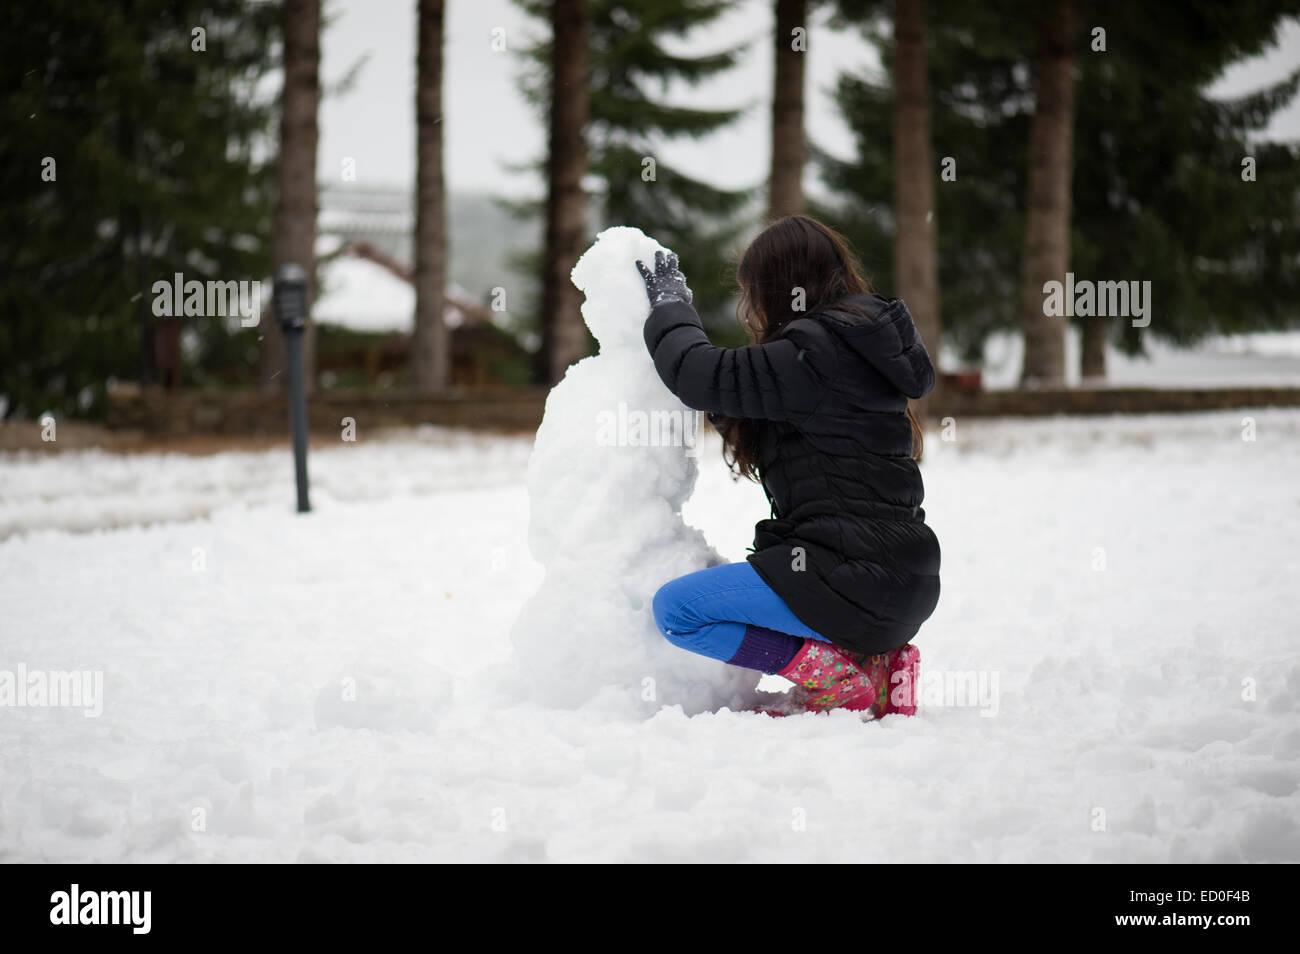 Girl making a snowman Photo Stock